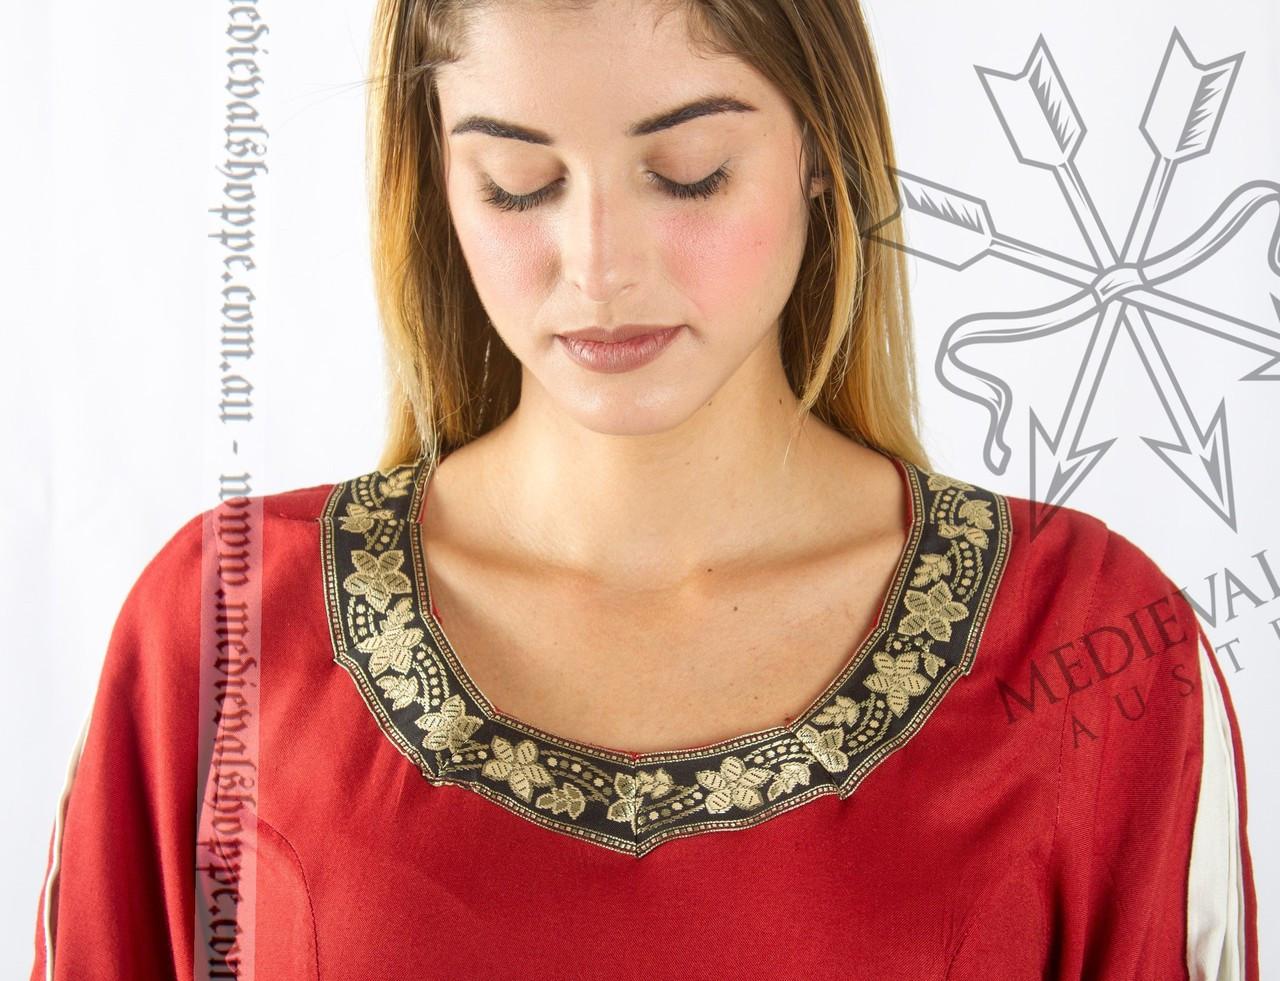 15th century medieval dress